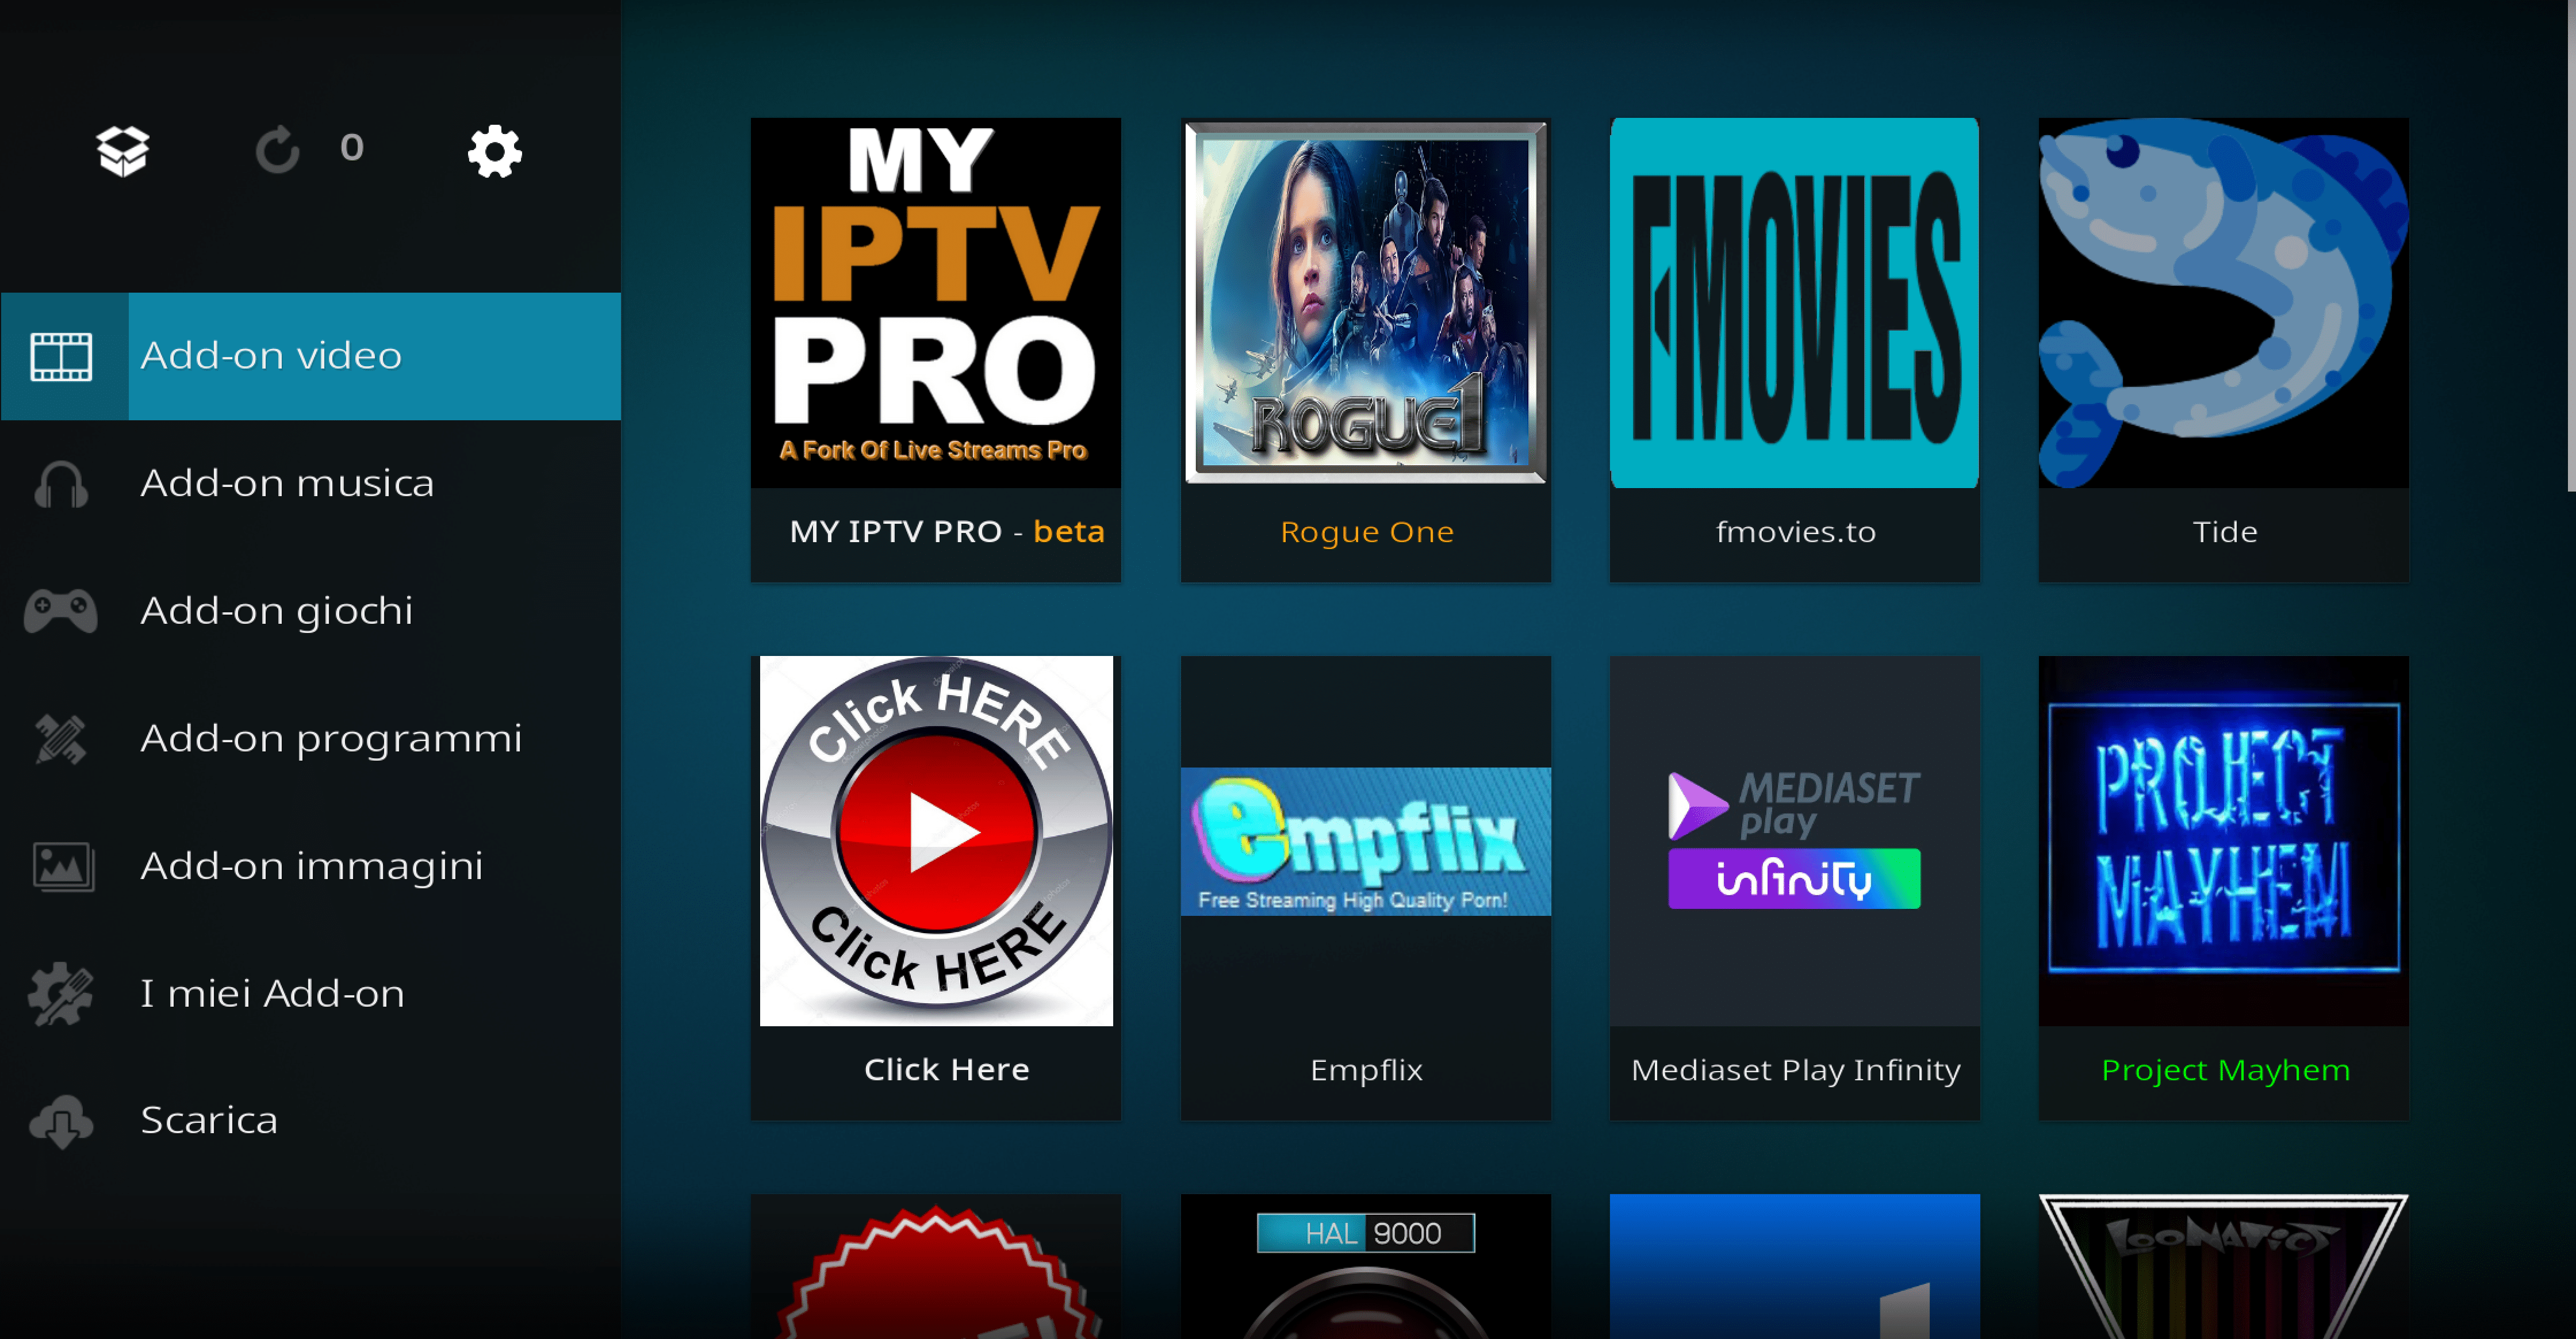 My IPTV Pro